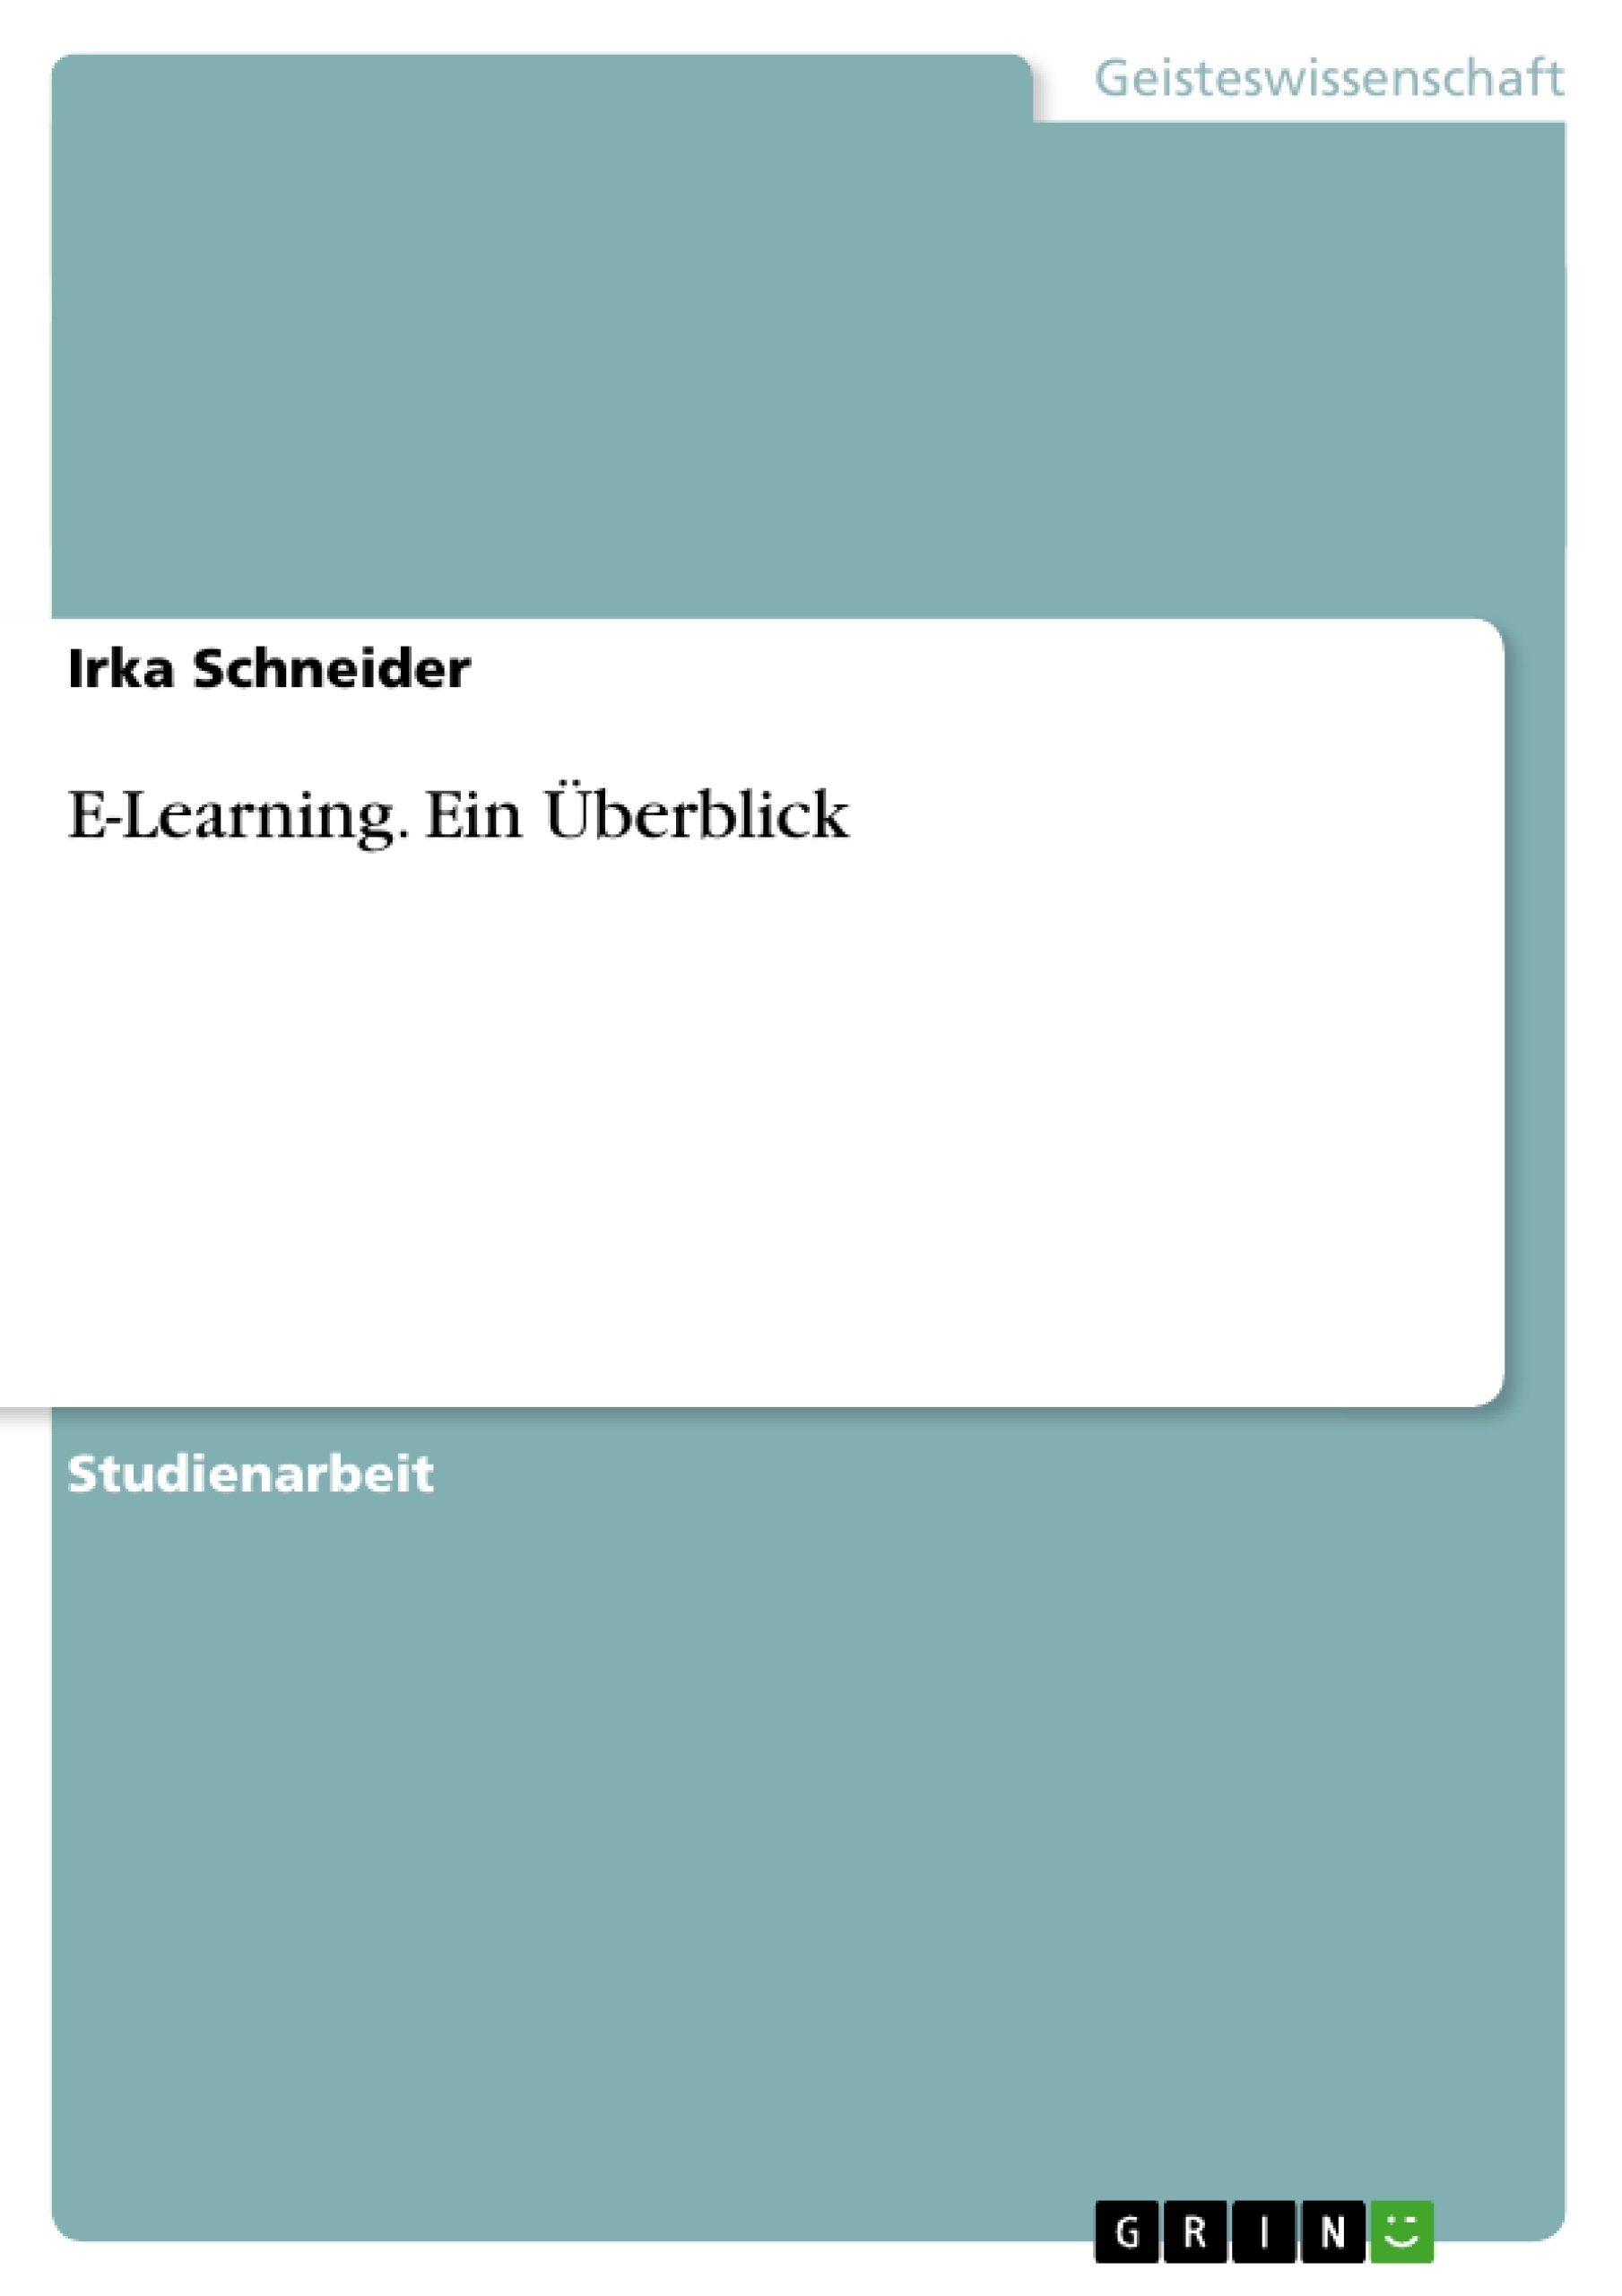 Titel: E-Learning. Ein Überblick